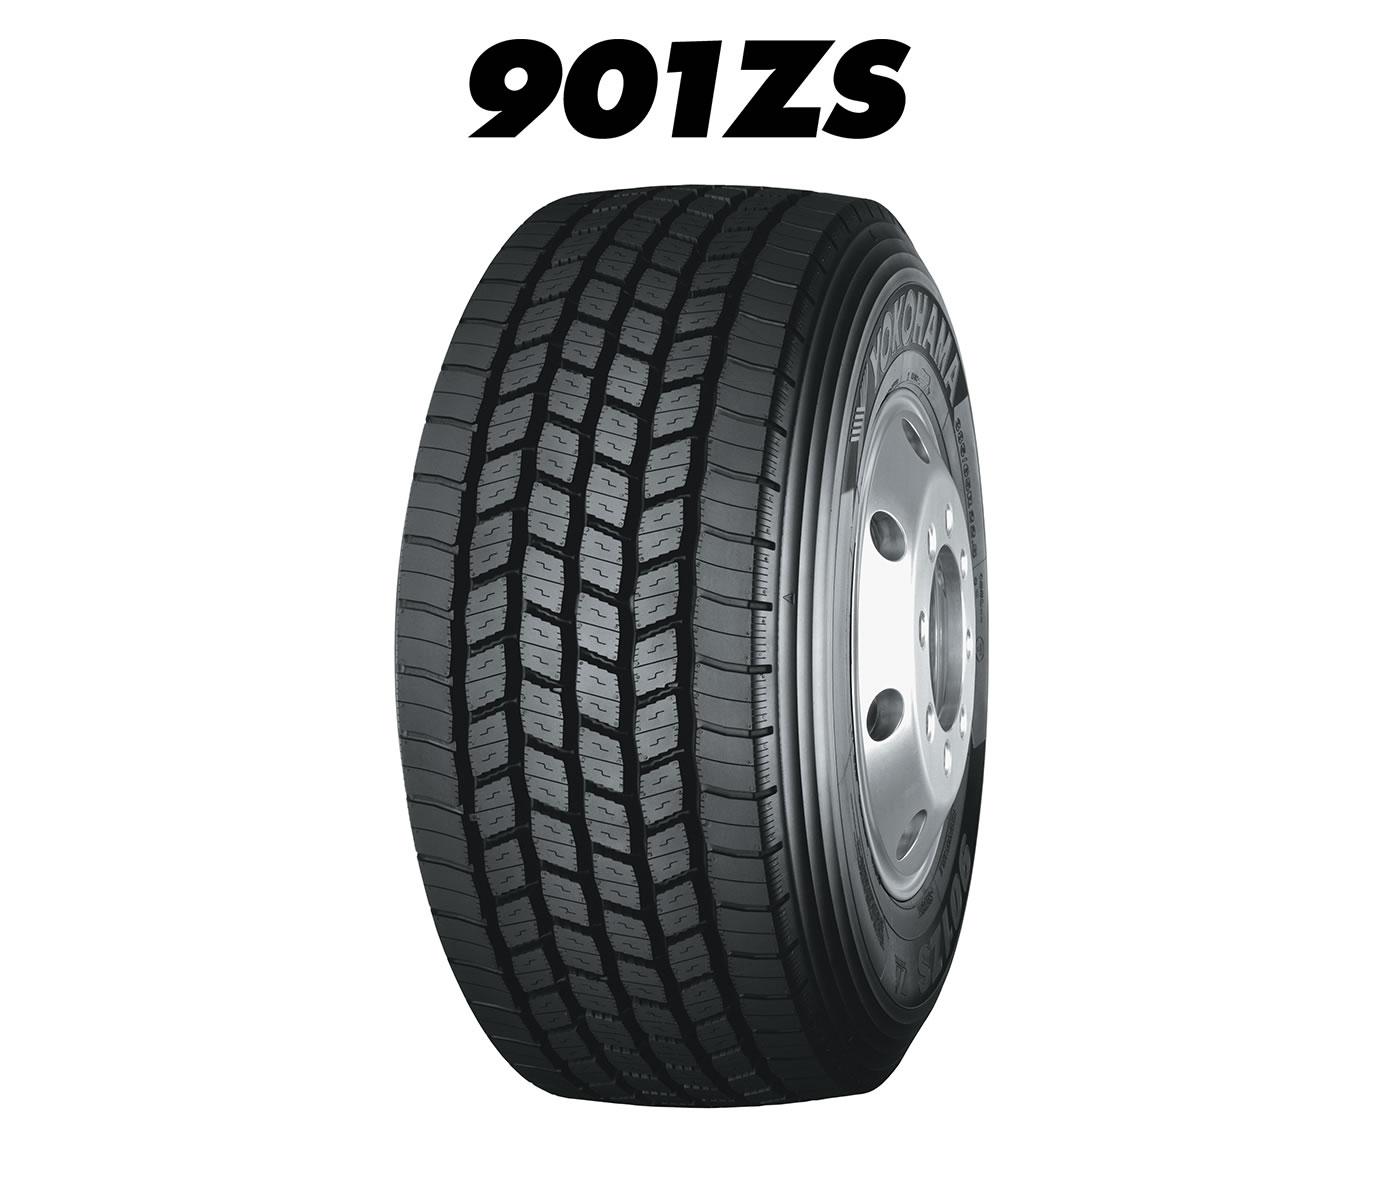 YOKOHAMA-38565-R-225-901ZS-Tehergepkocsi-potkocsi-901ZS-gumi-